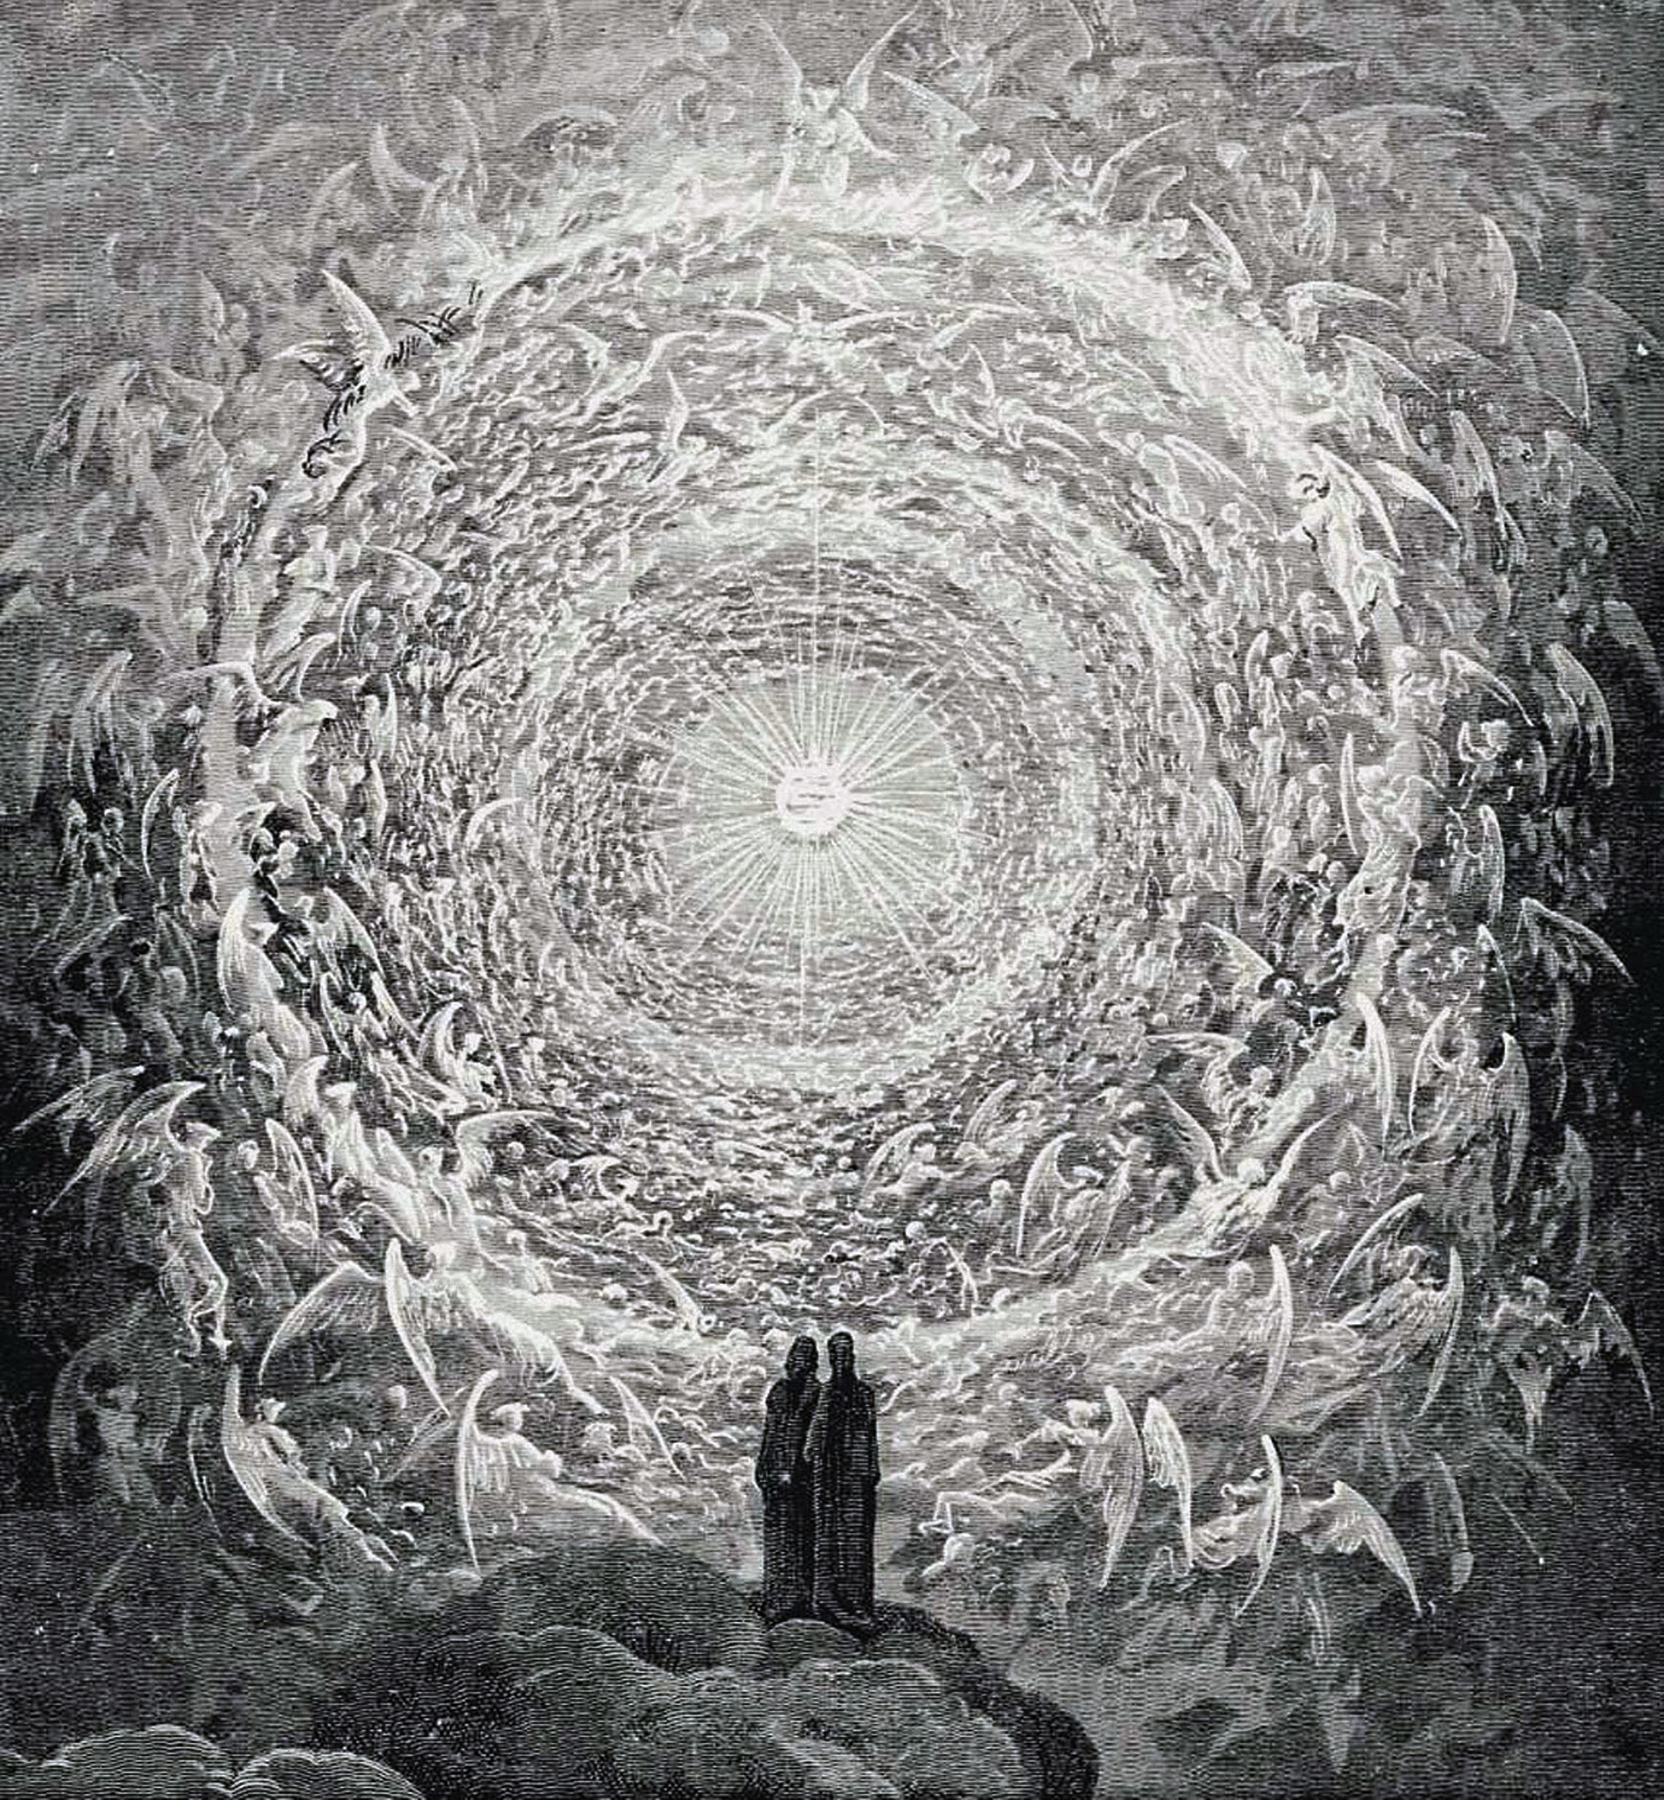 gustave-dore-paradiso-canto-34-1868-trivium-art-history